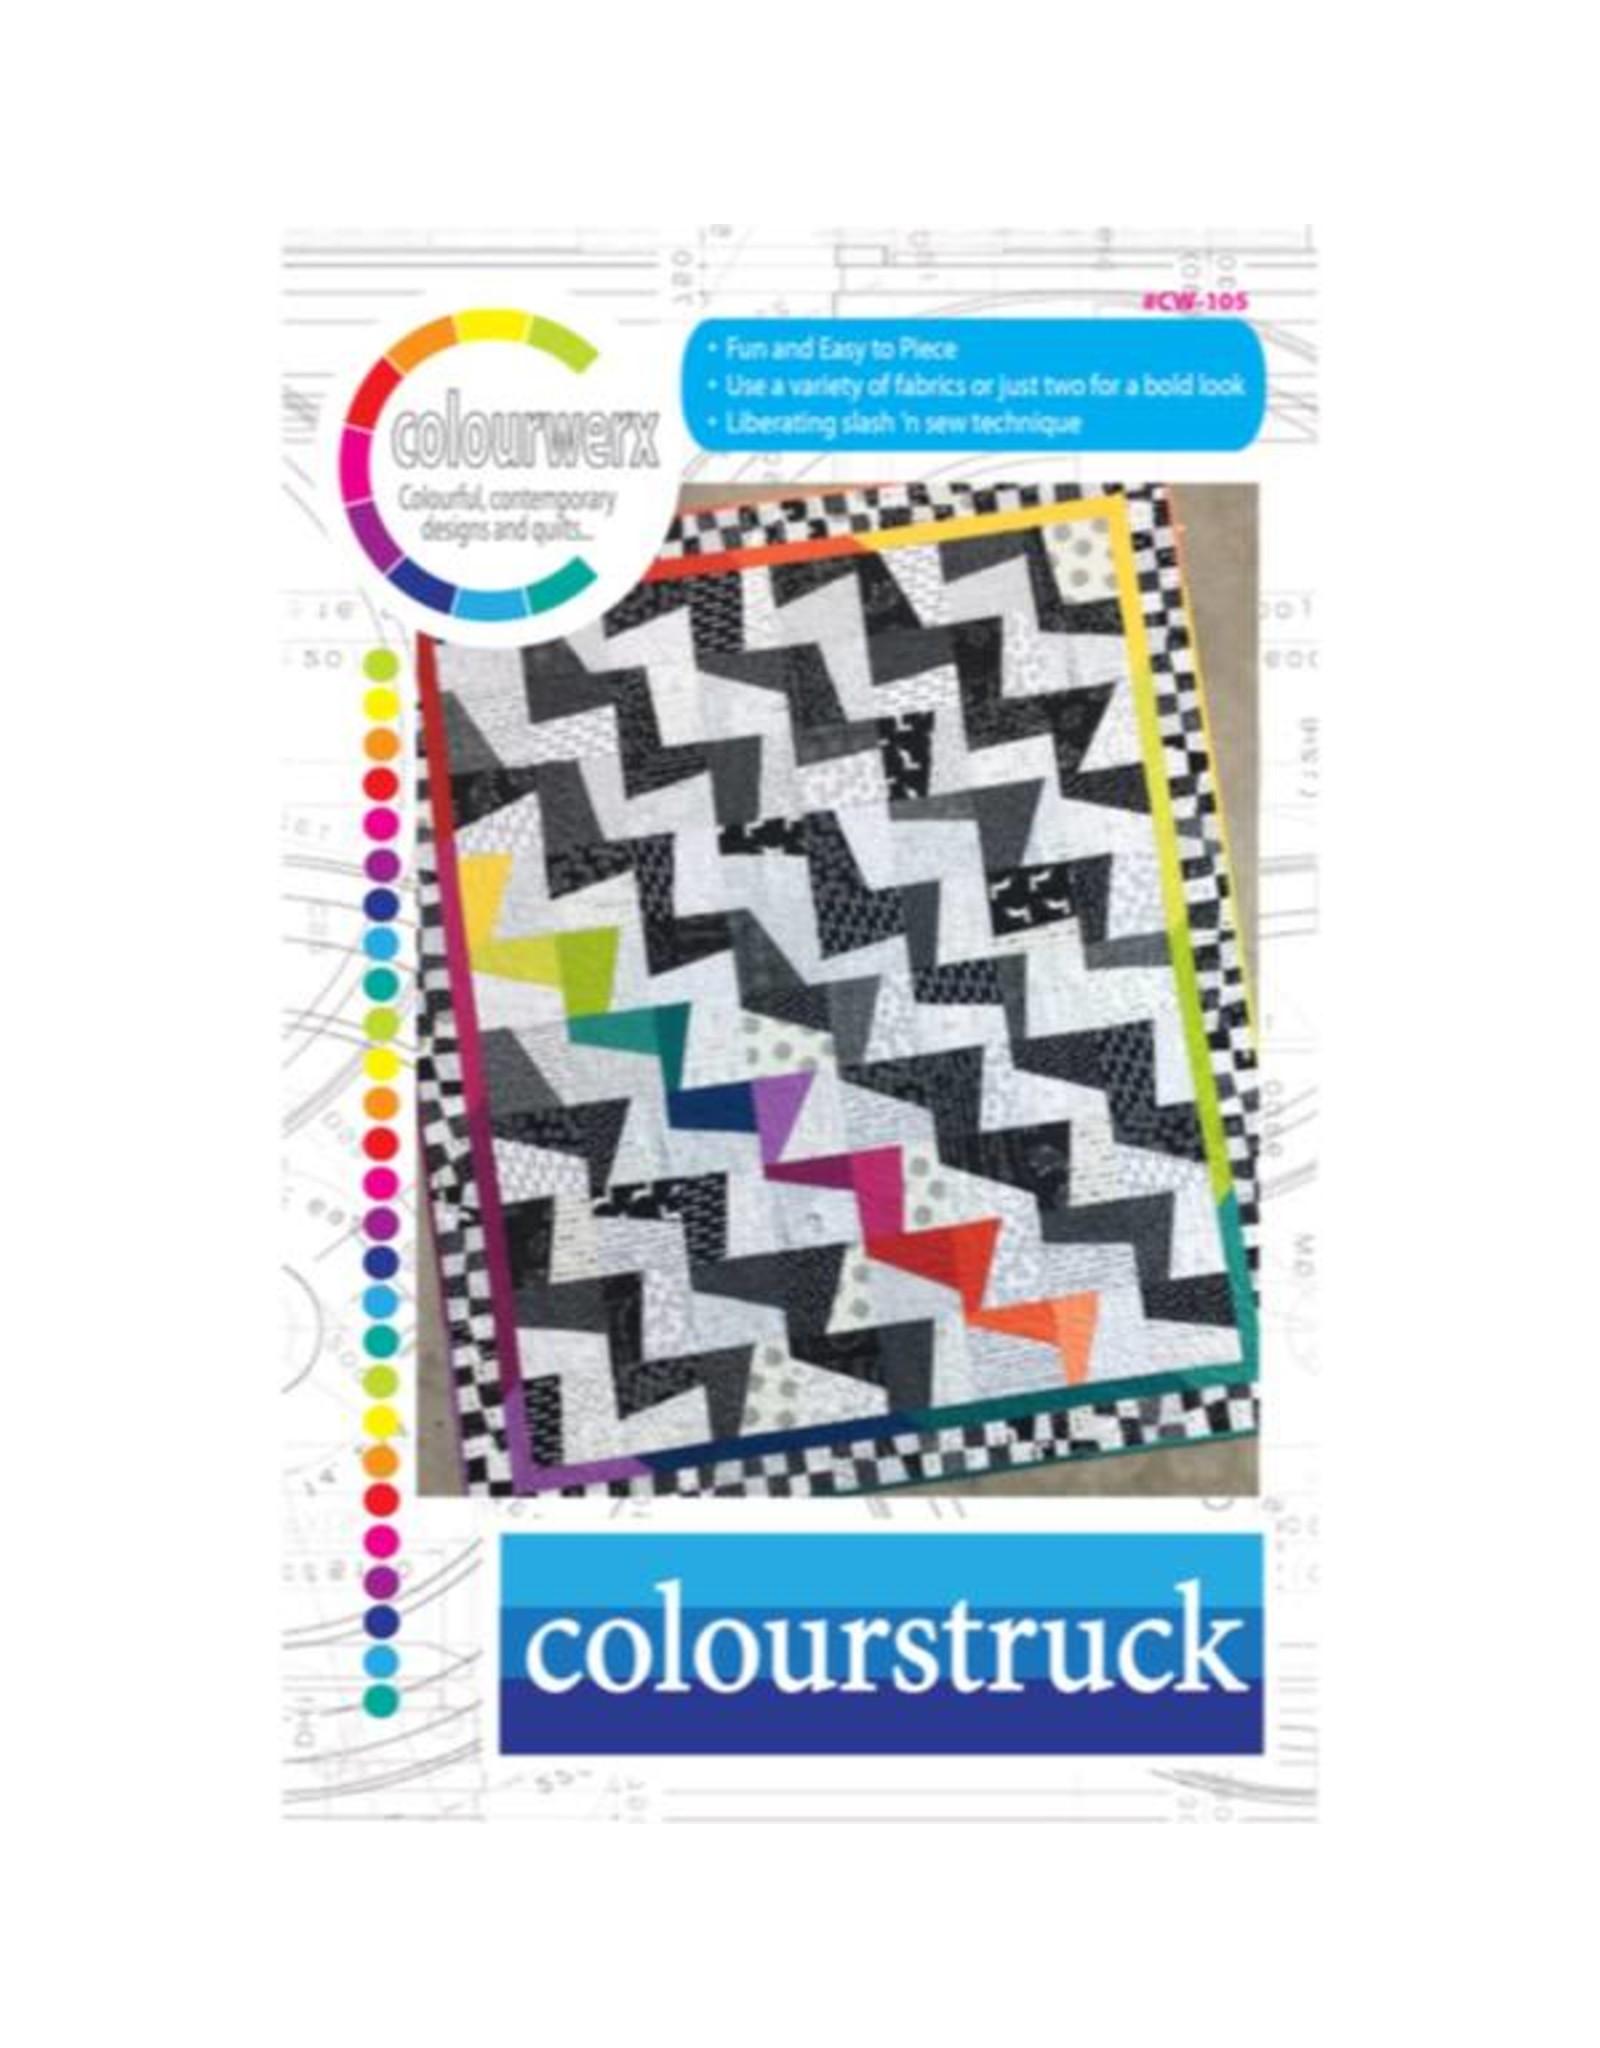 Colourwerx Colourstruck